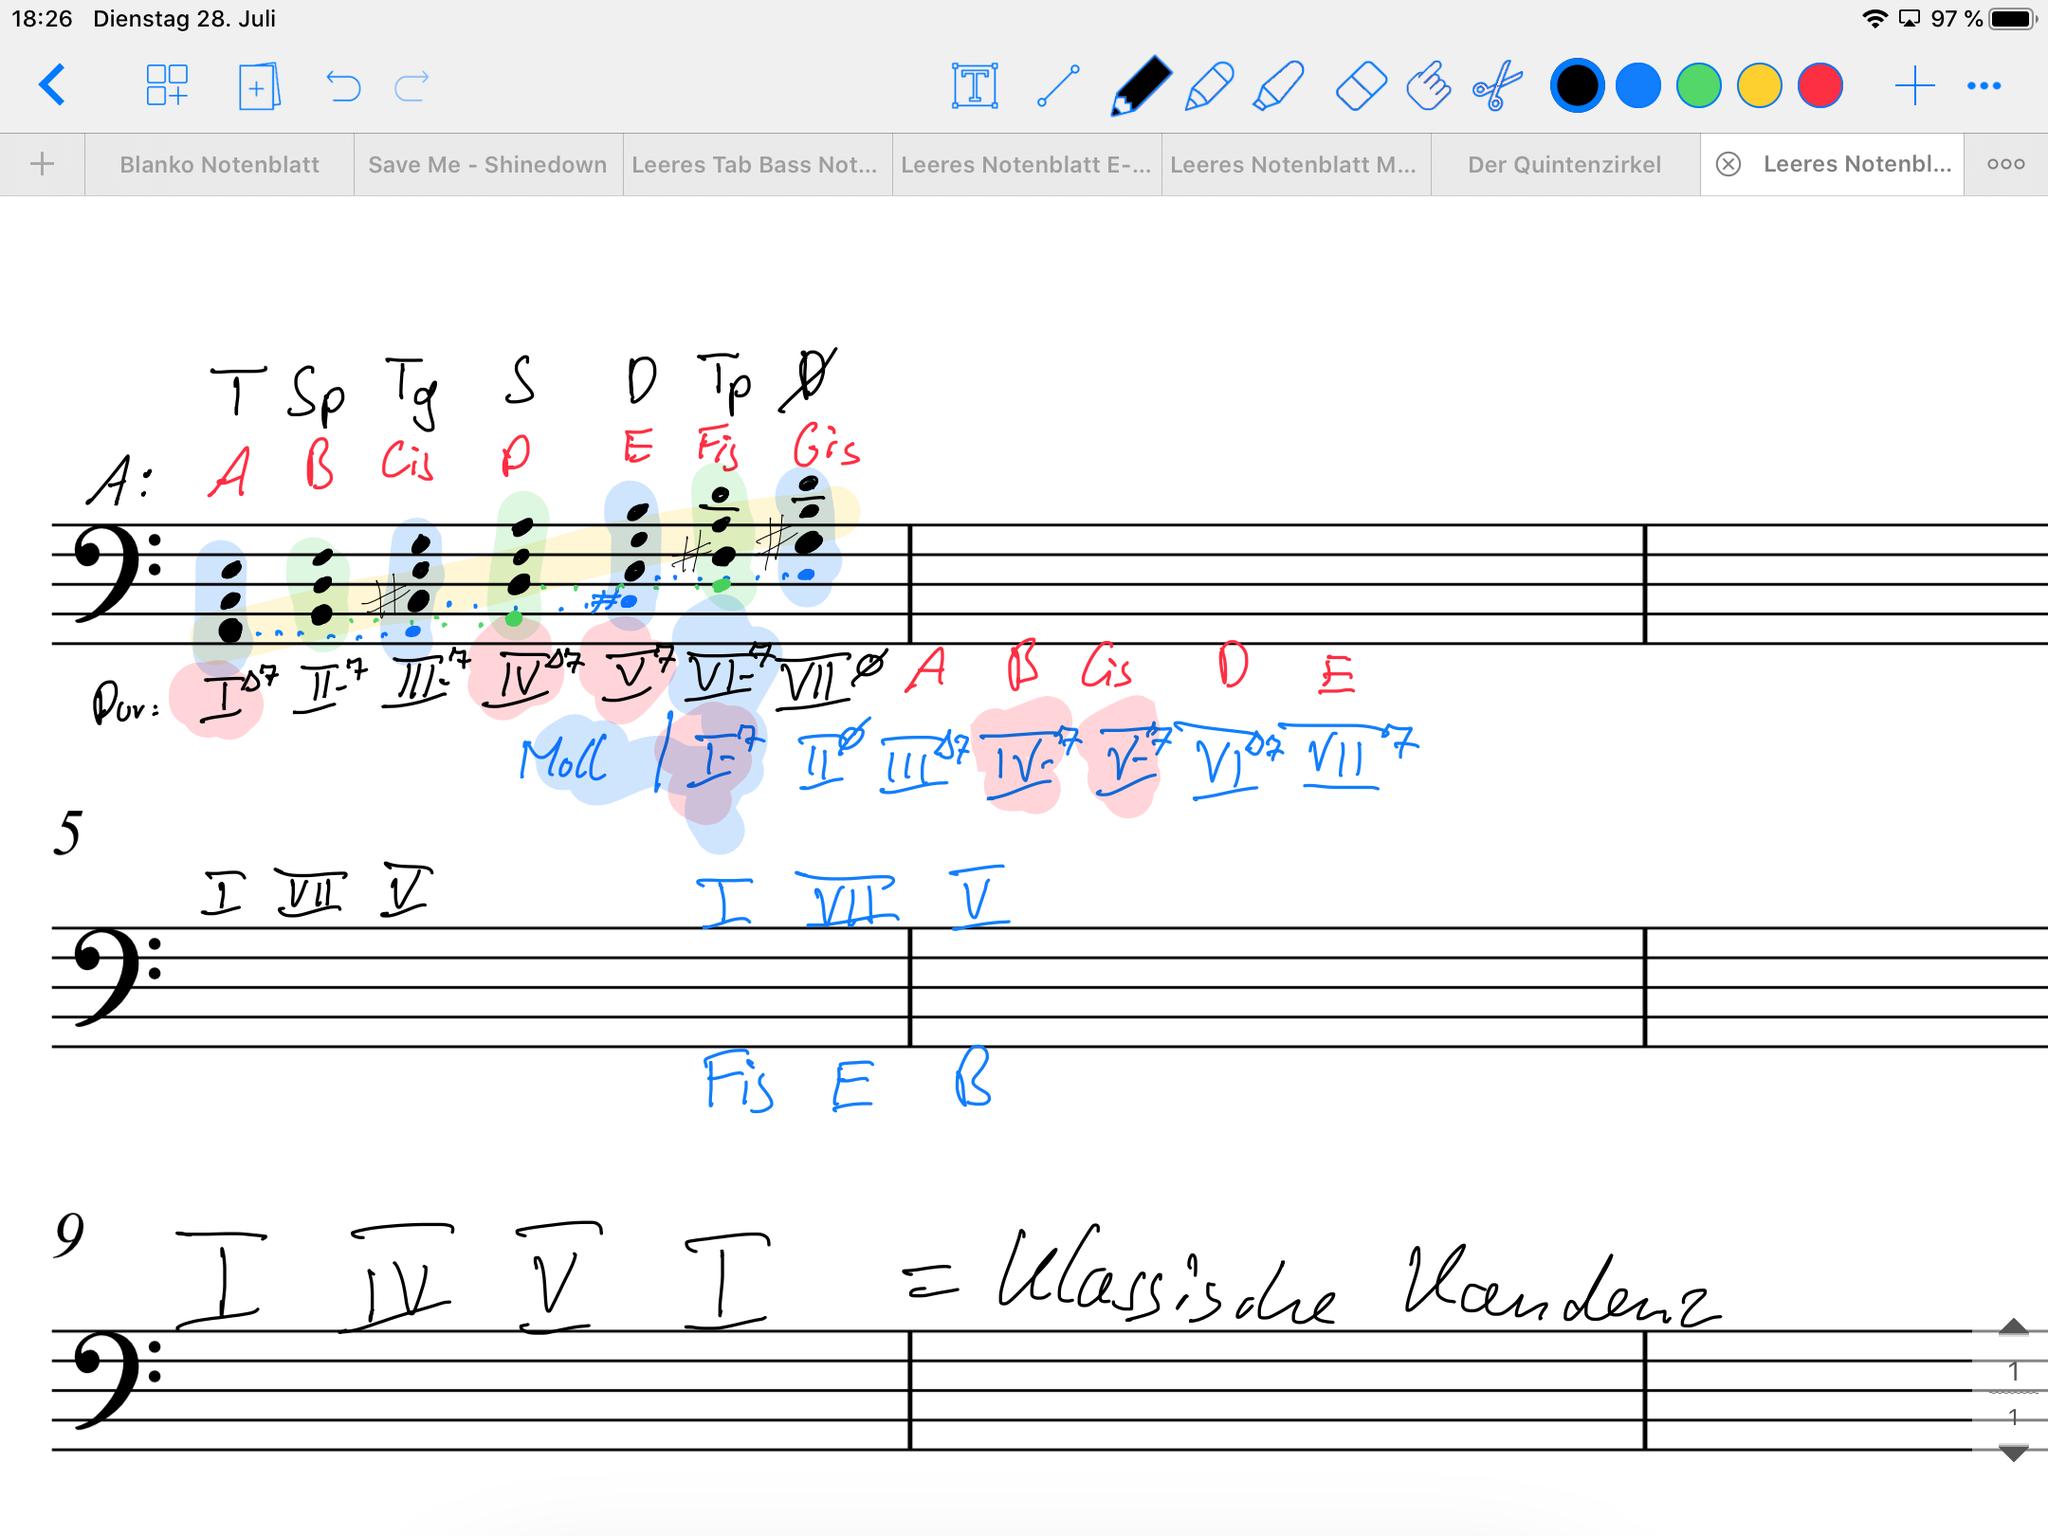 Bsp. digitale Tafelanschrift Harmonielehre